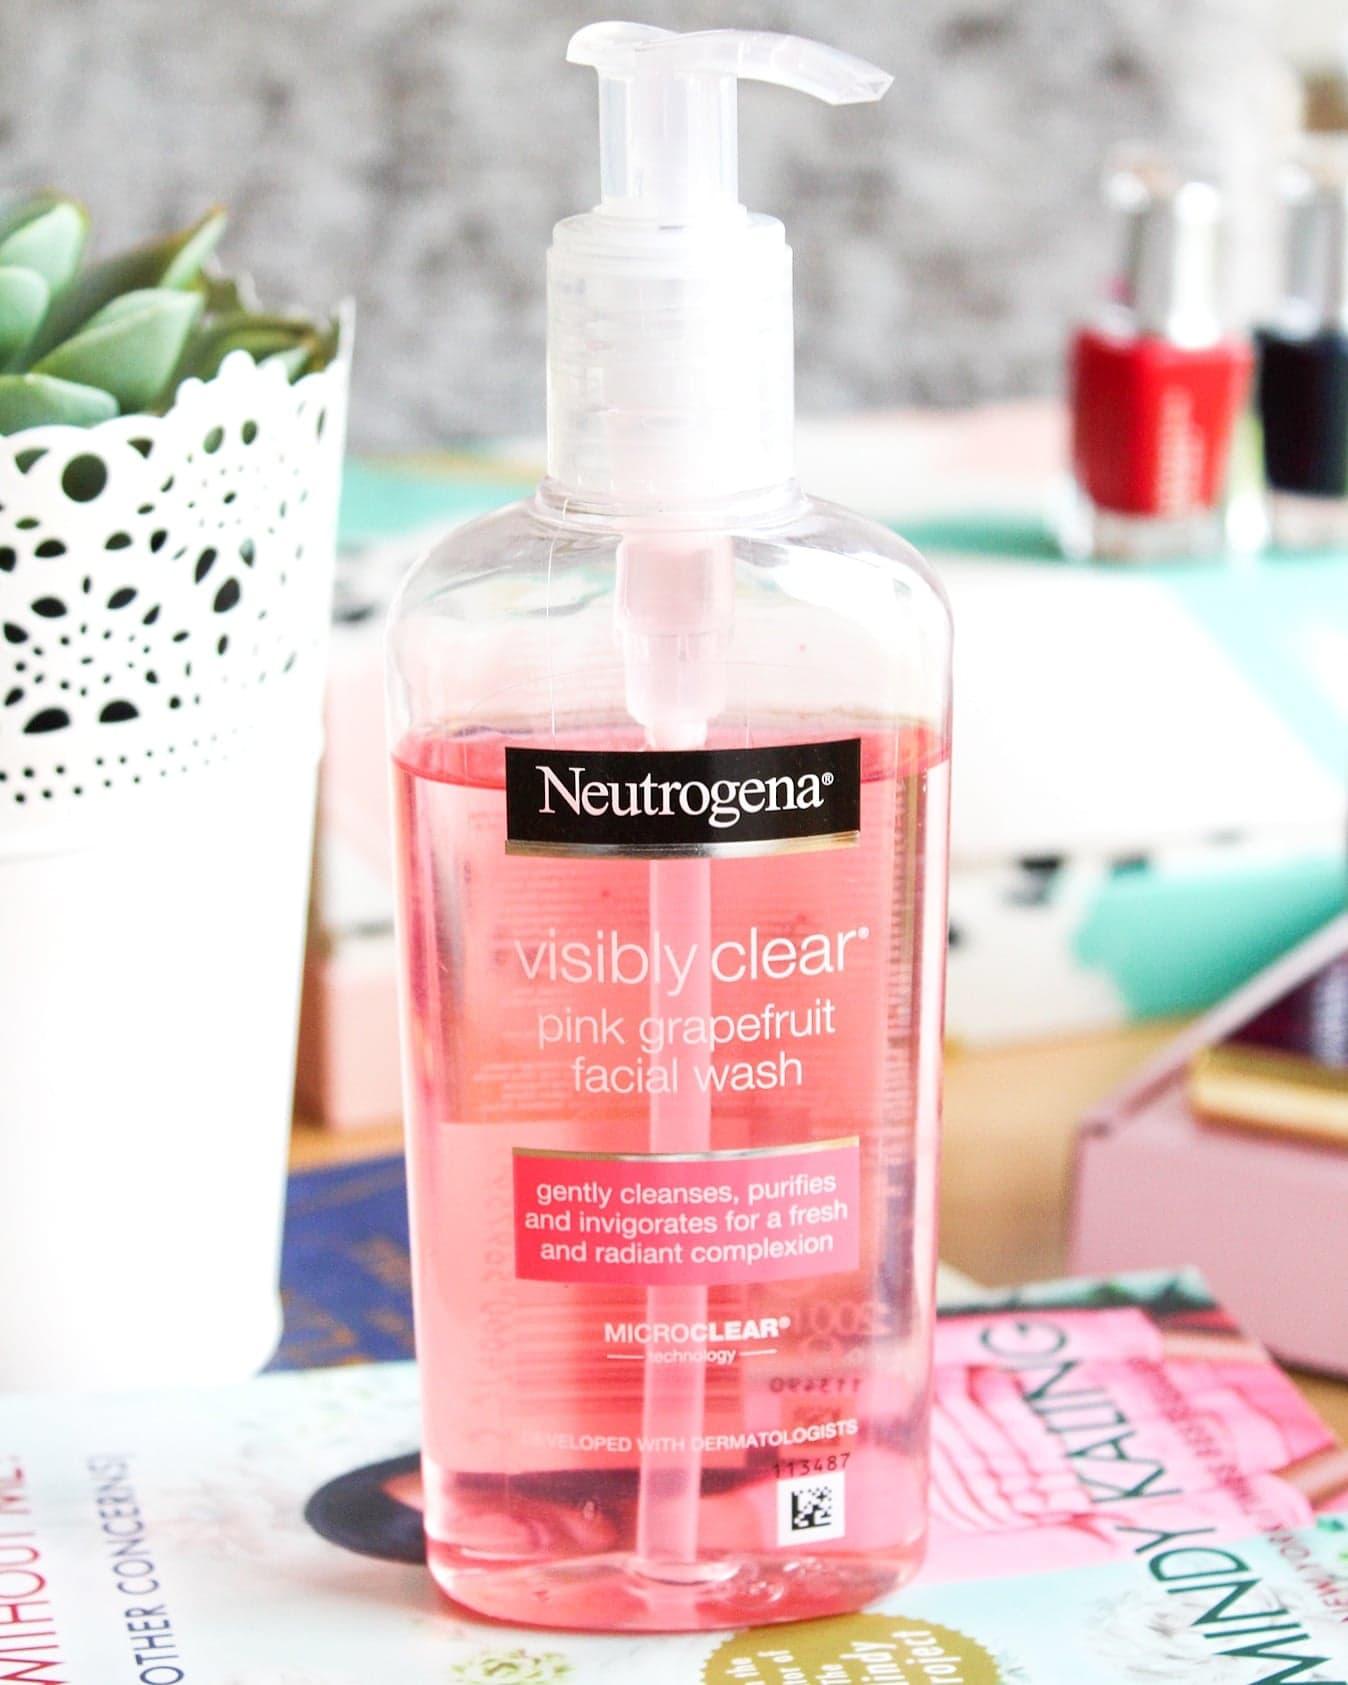 Neutrogena Visibly Clear Pink Grapefruit Facial Wash